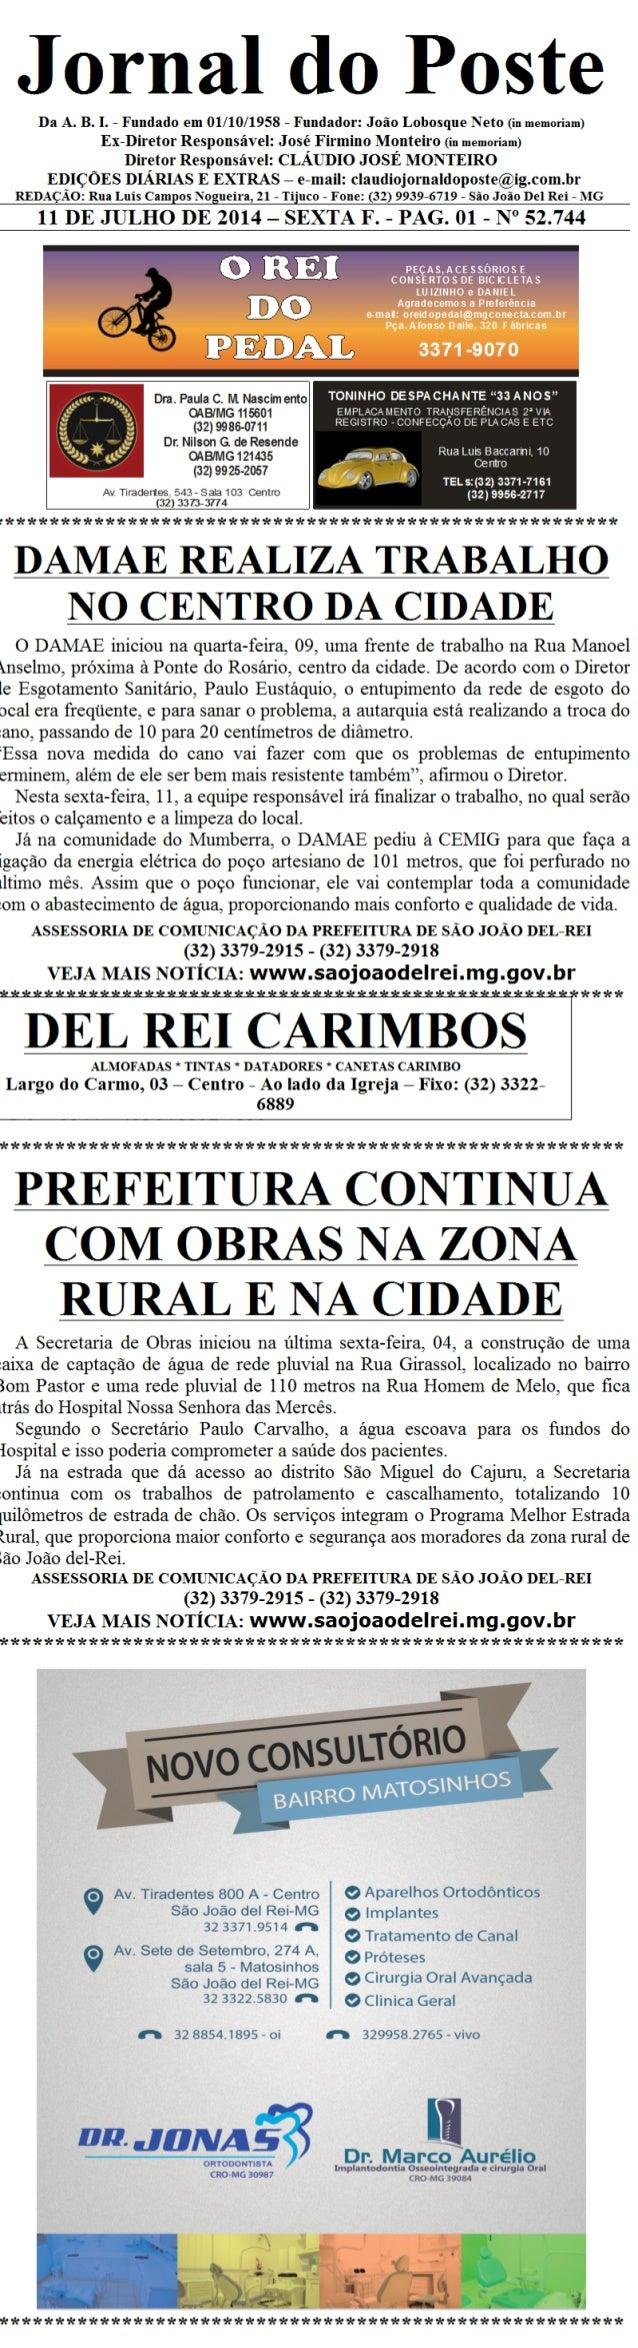 Jornal do poste 11 b 1